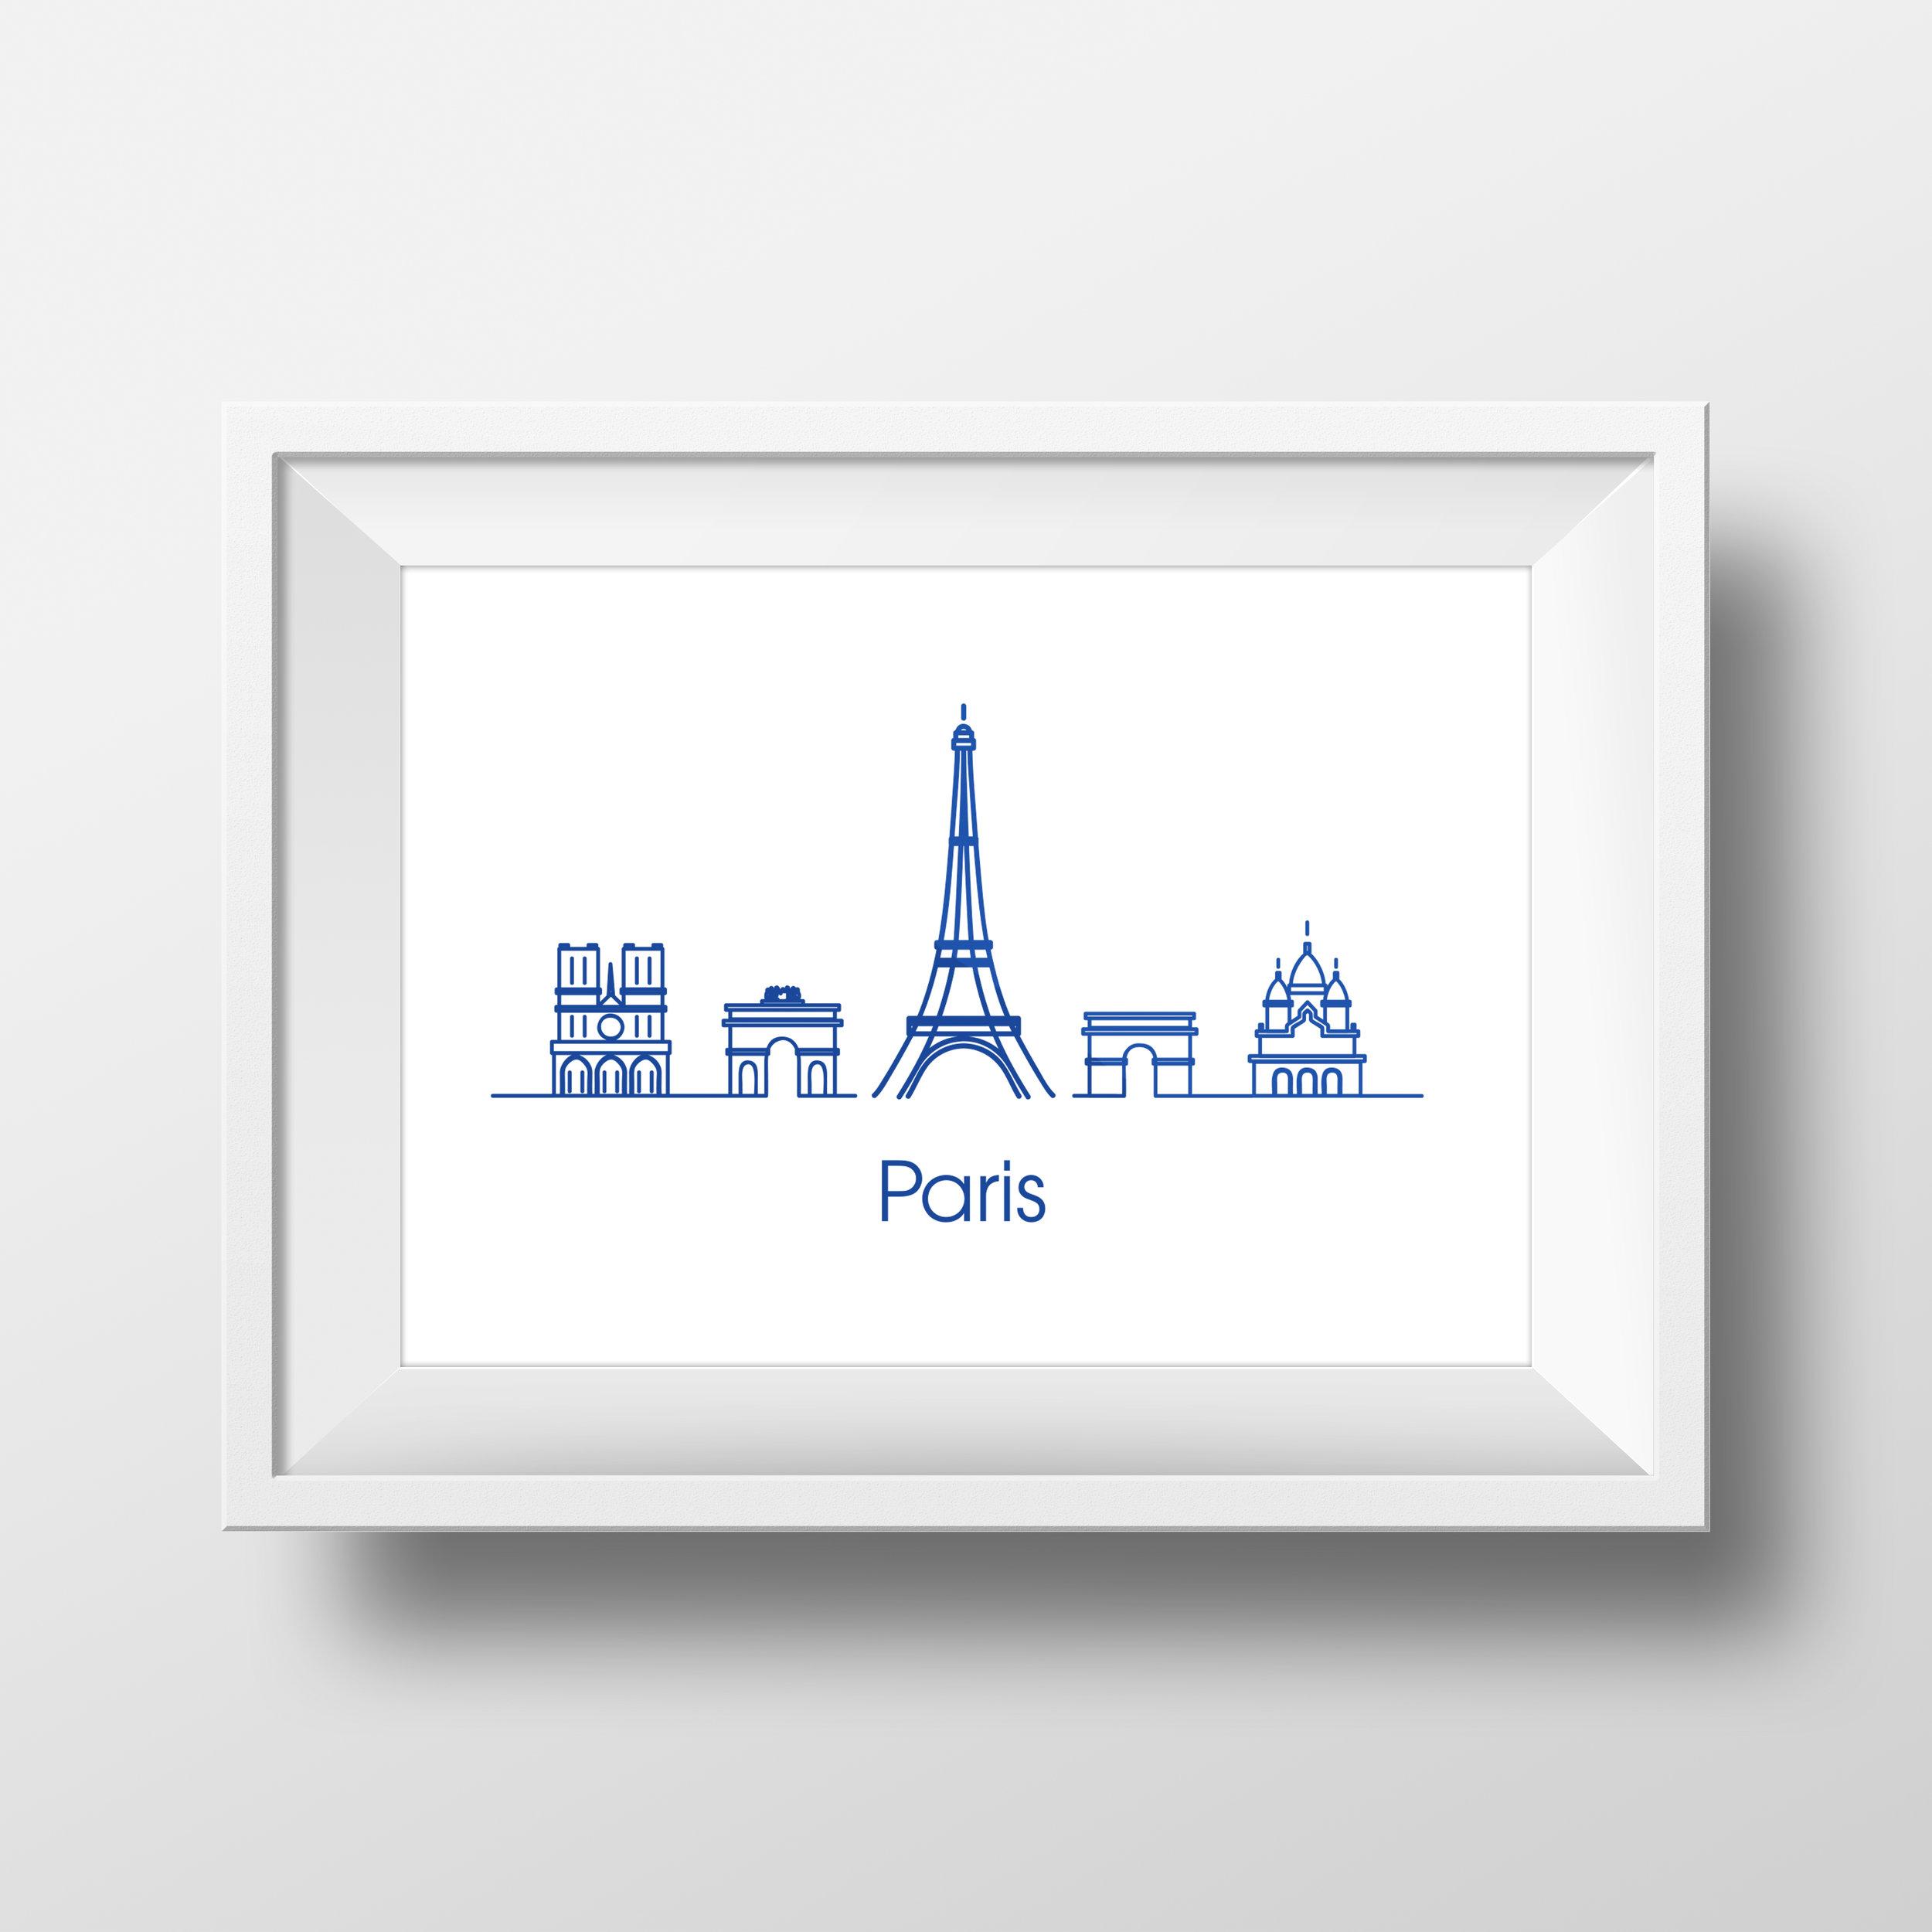 Aladdin_AveoWaterBottle_Paris_01-Mocks-Up-Frame-Hbd.jpg